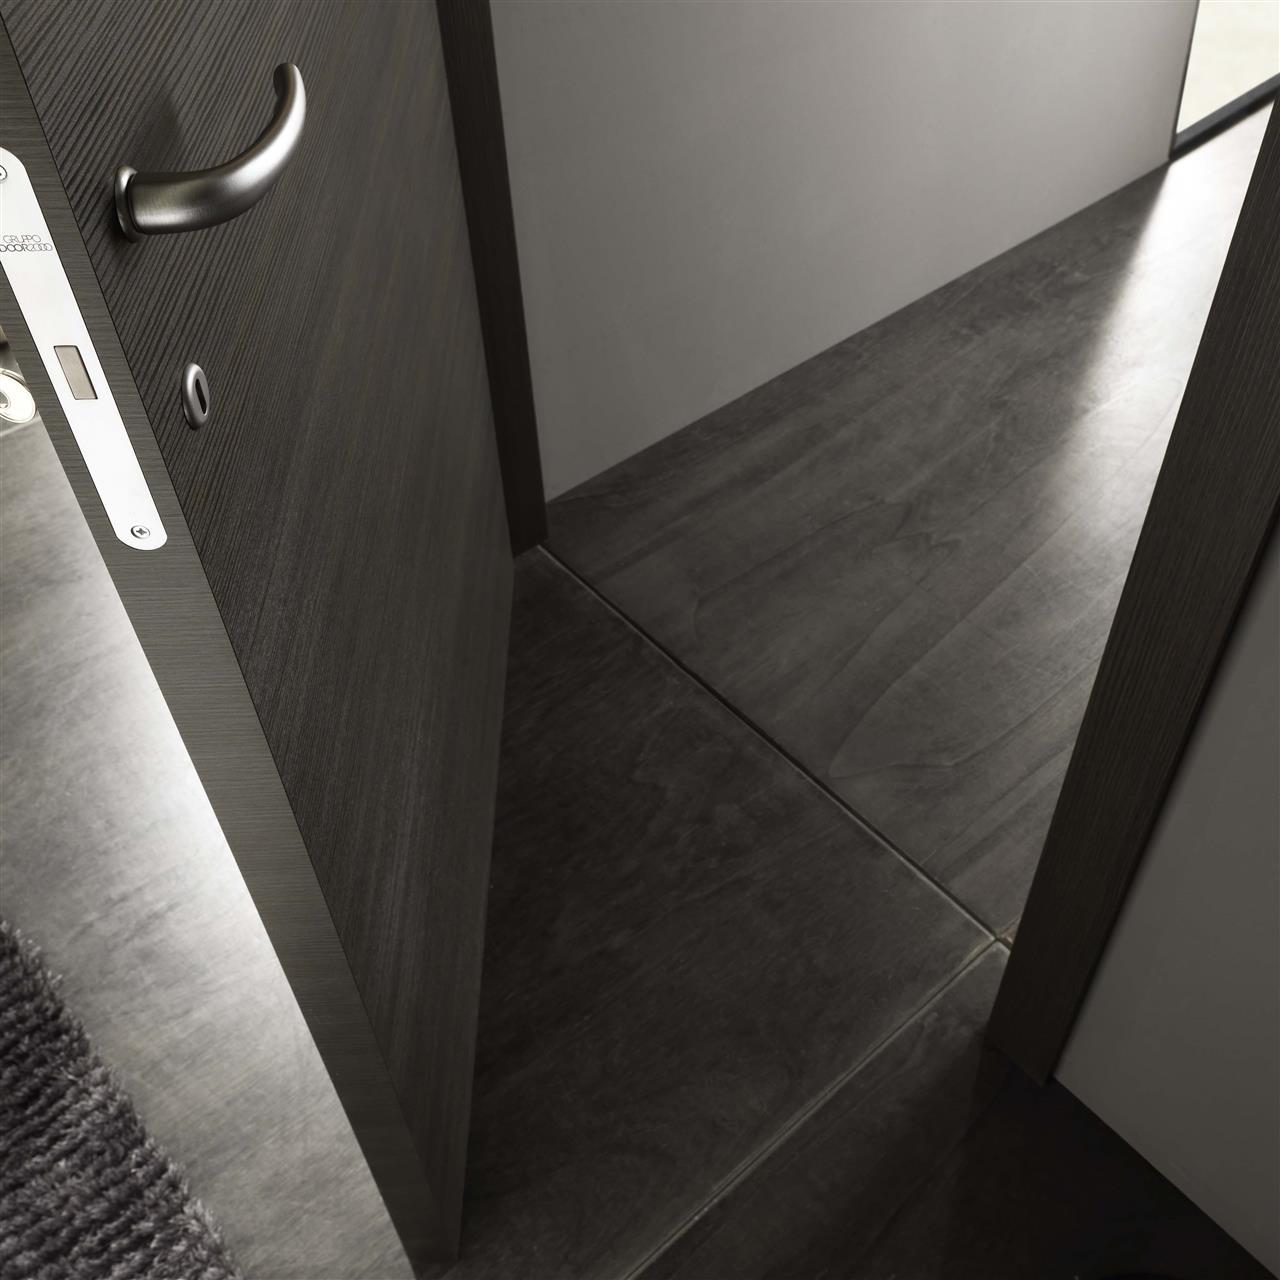 Carousel_98_Moon grigio spazzolato doorc4p3_0011.jpg